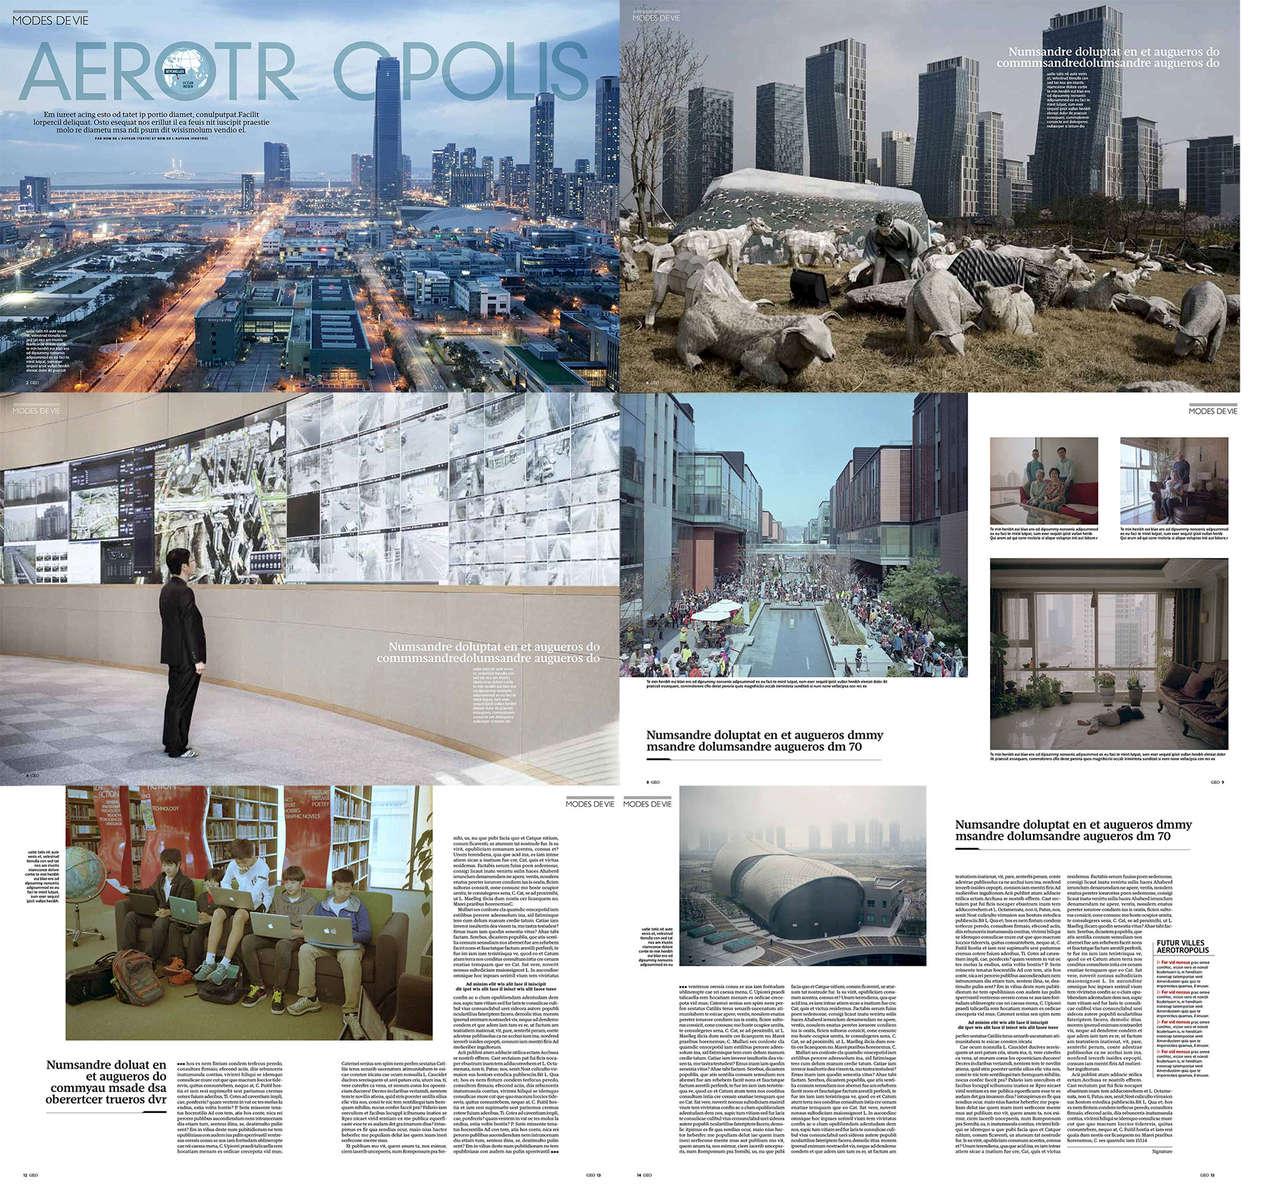 Aerotropolis for Geo